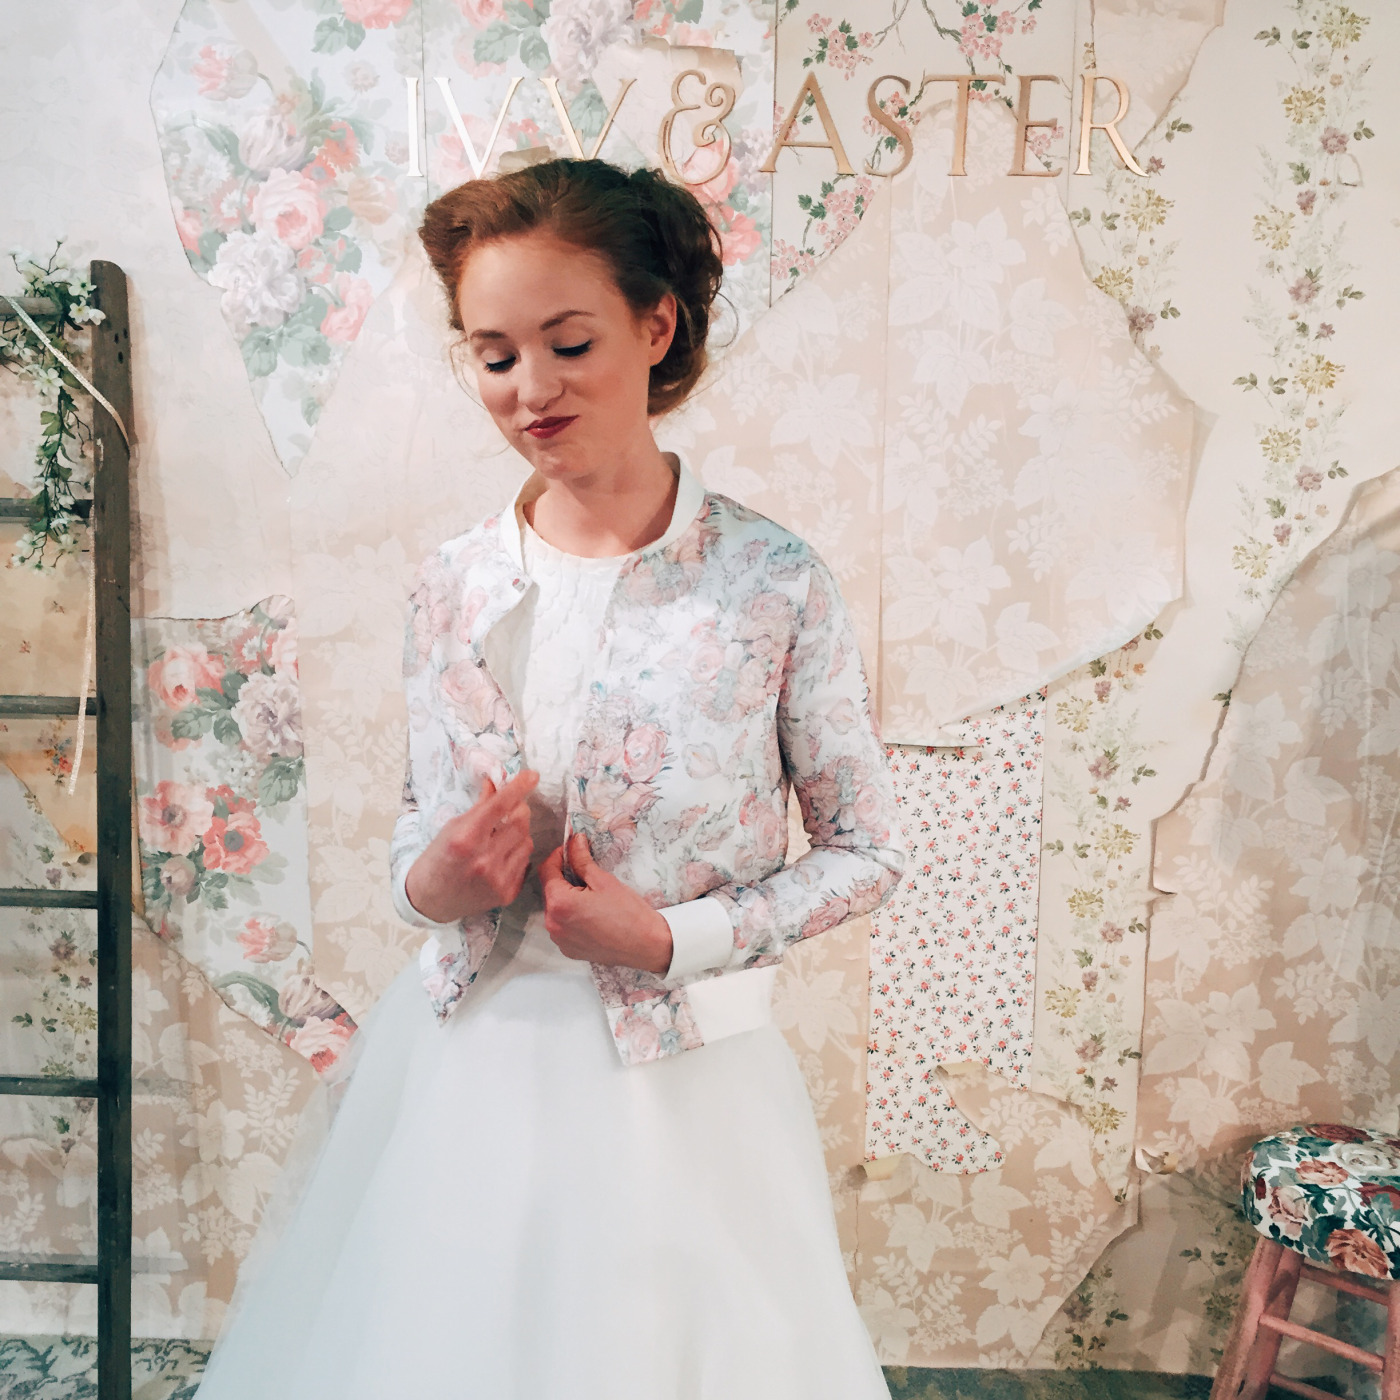 vintage-background-wedding-dress-photography-wallpaper-wp600334